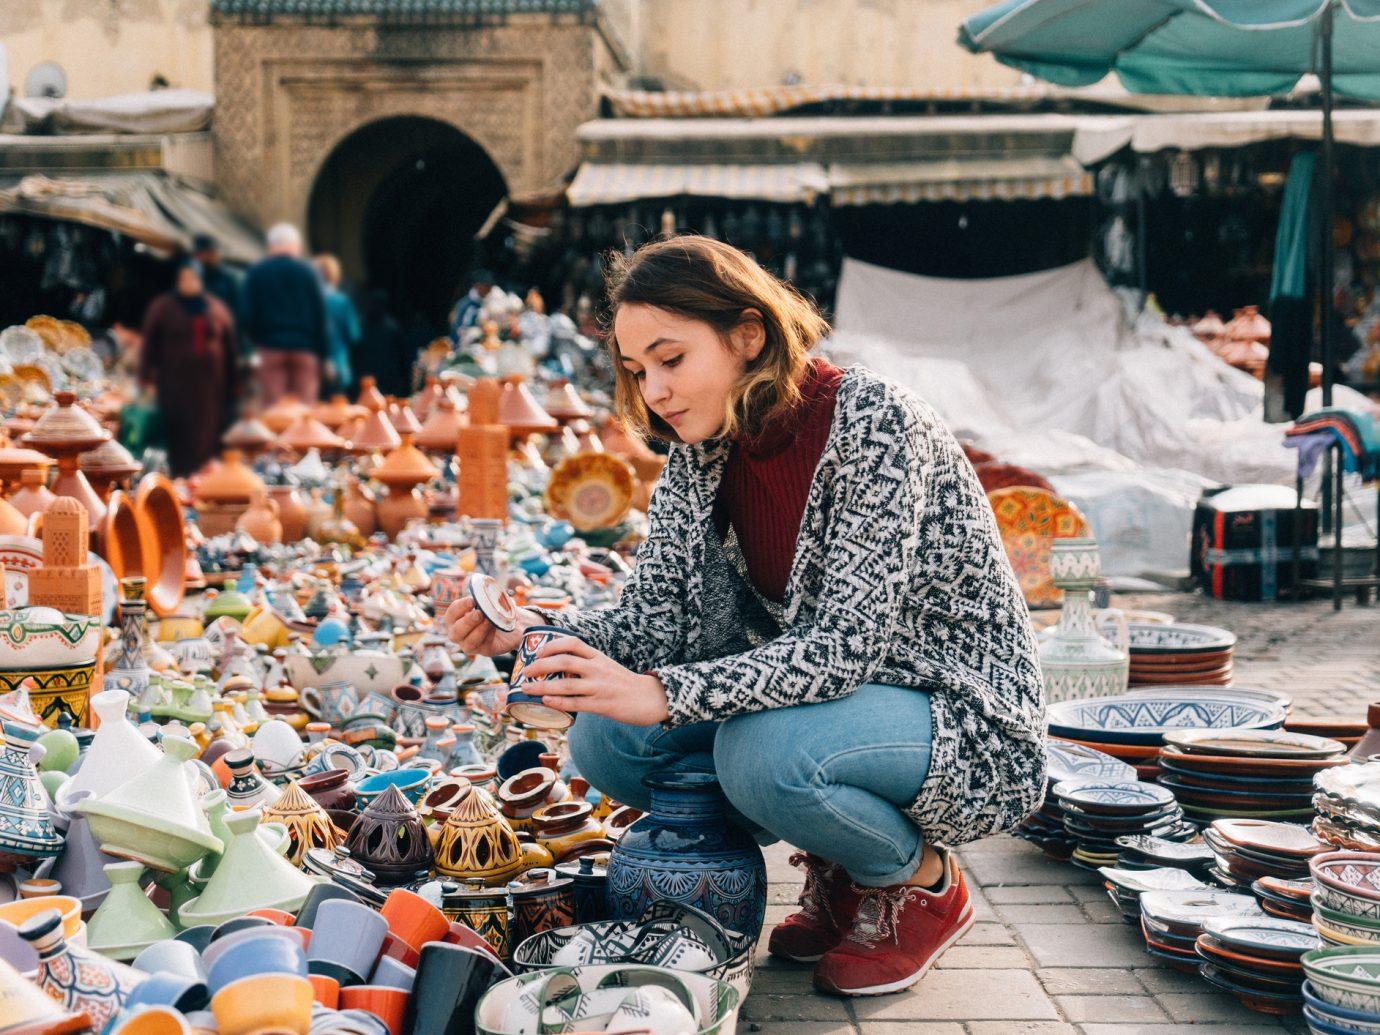 Young Caucasian woman choosing Ceramic in shop in Meknes, Morocco